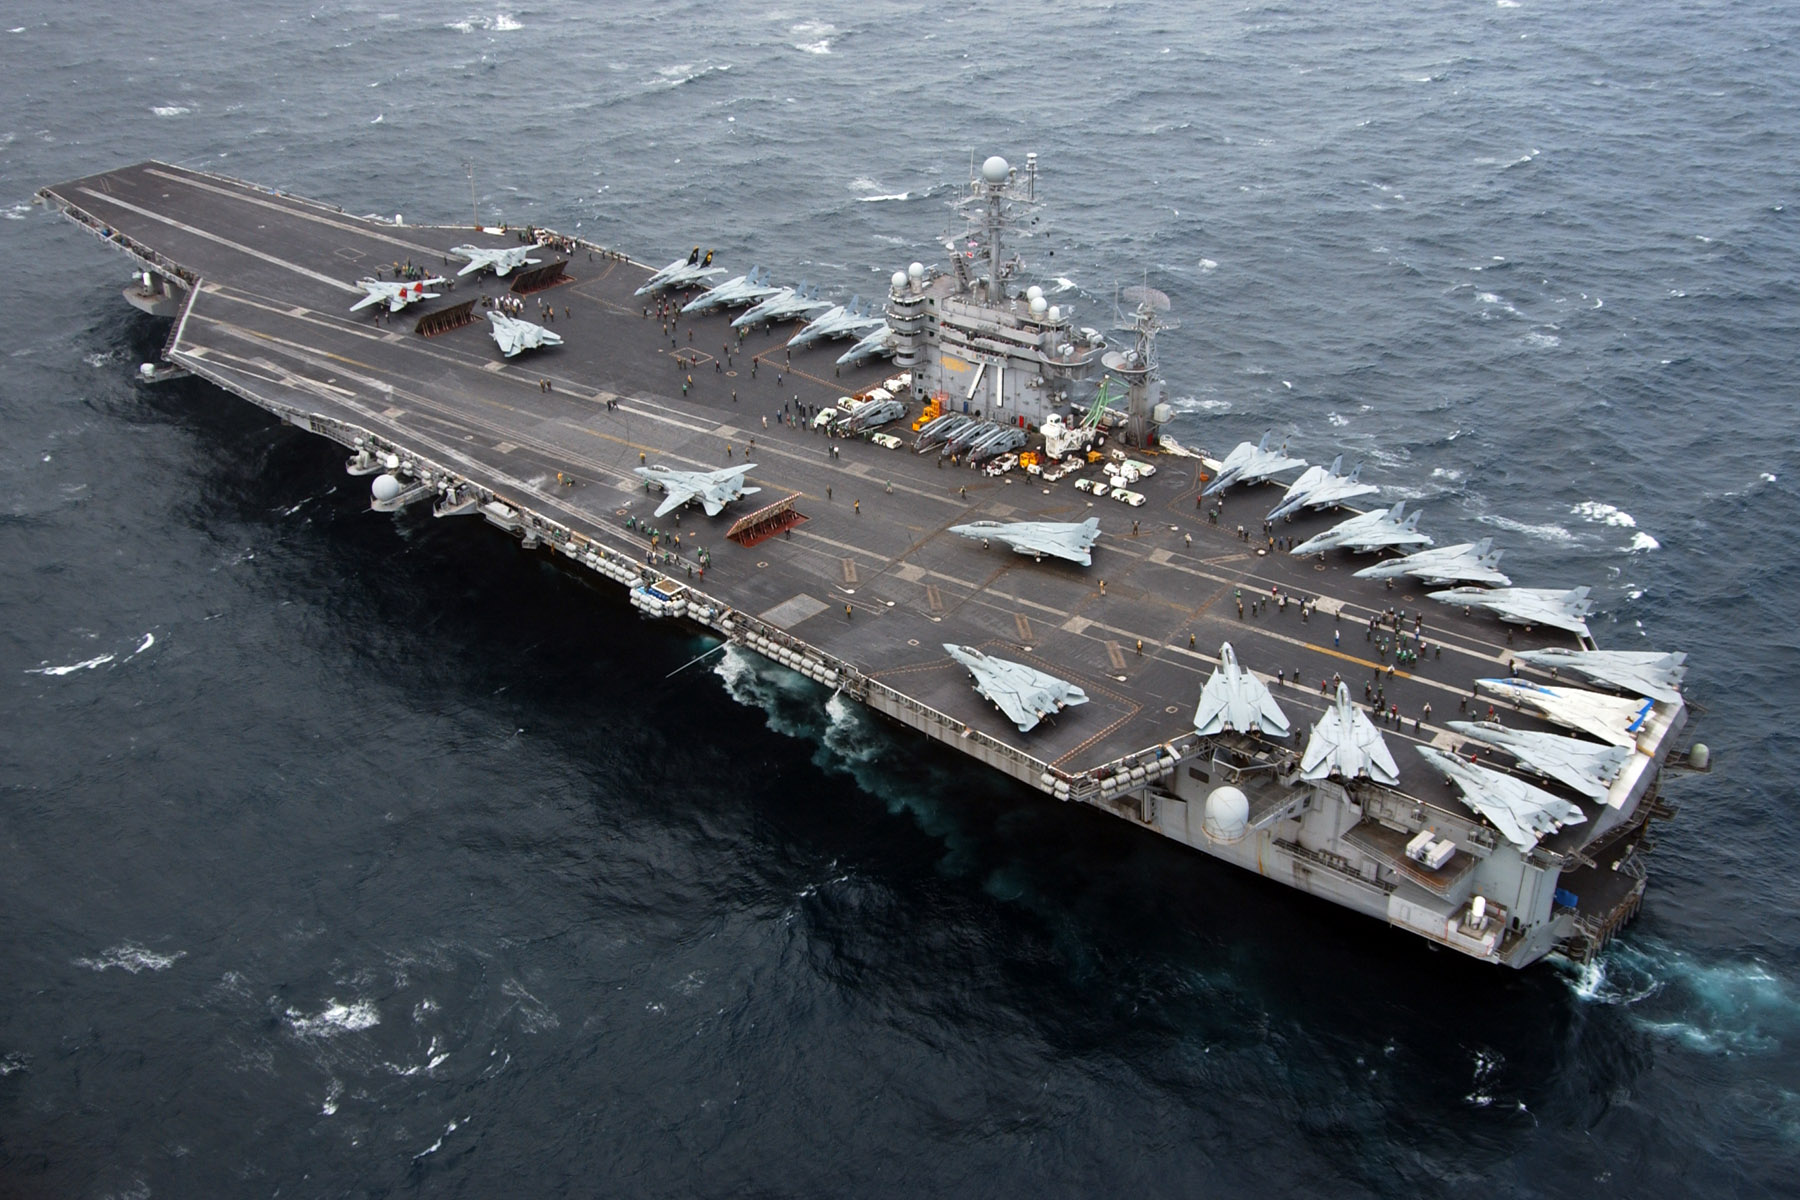 CV & CVN : Aircraft Carriers - Porte-avions - Page 15 32783436476_0a311b5f2b_o